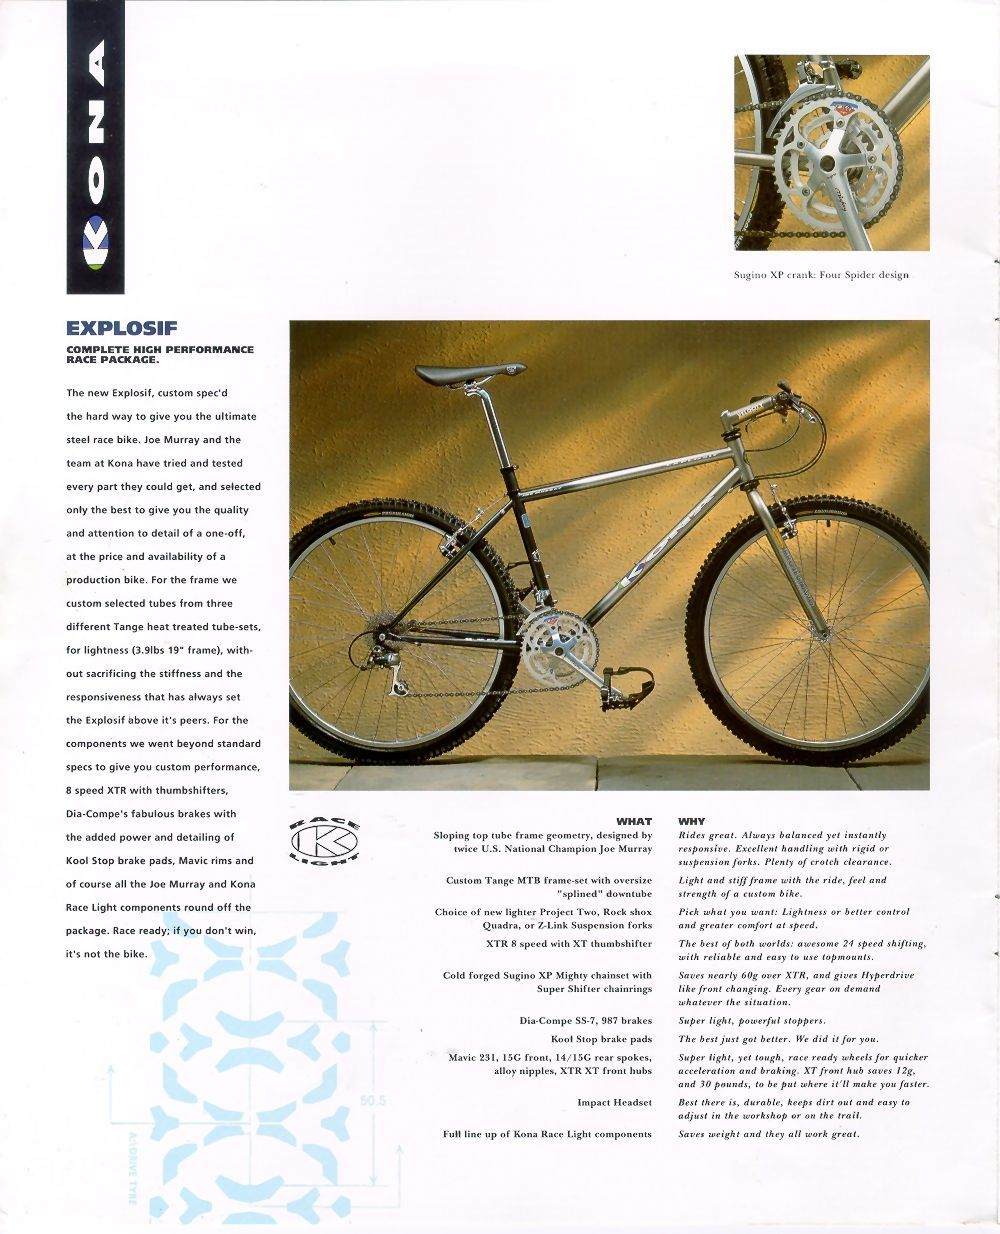 Best Model Year For A Particular Brand Retrobike In 2020 Classic Road Bike Kona Bikes Vintage Bikes